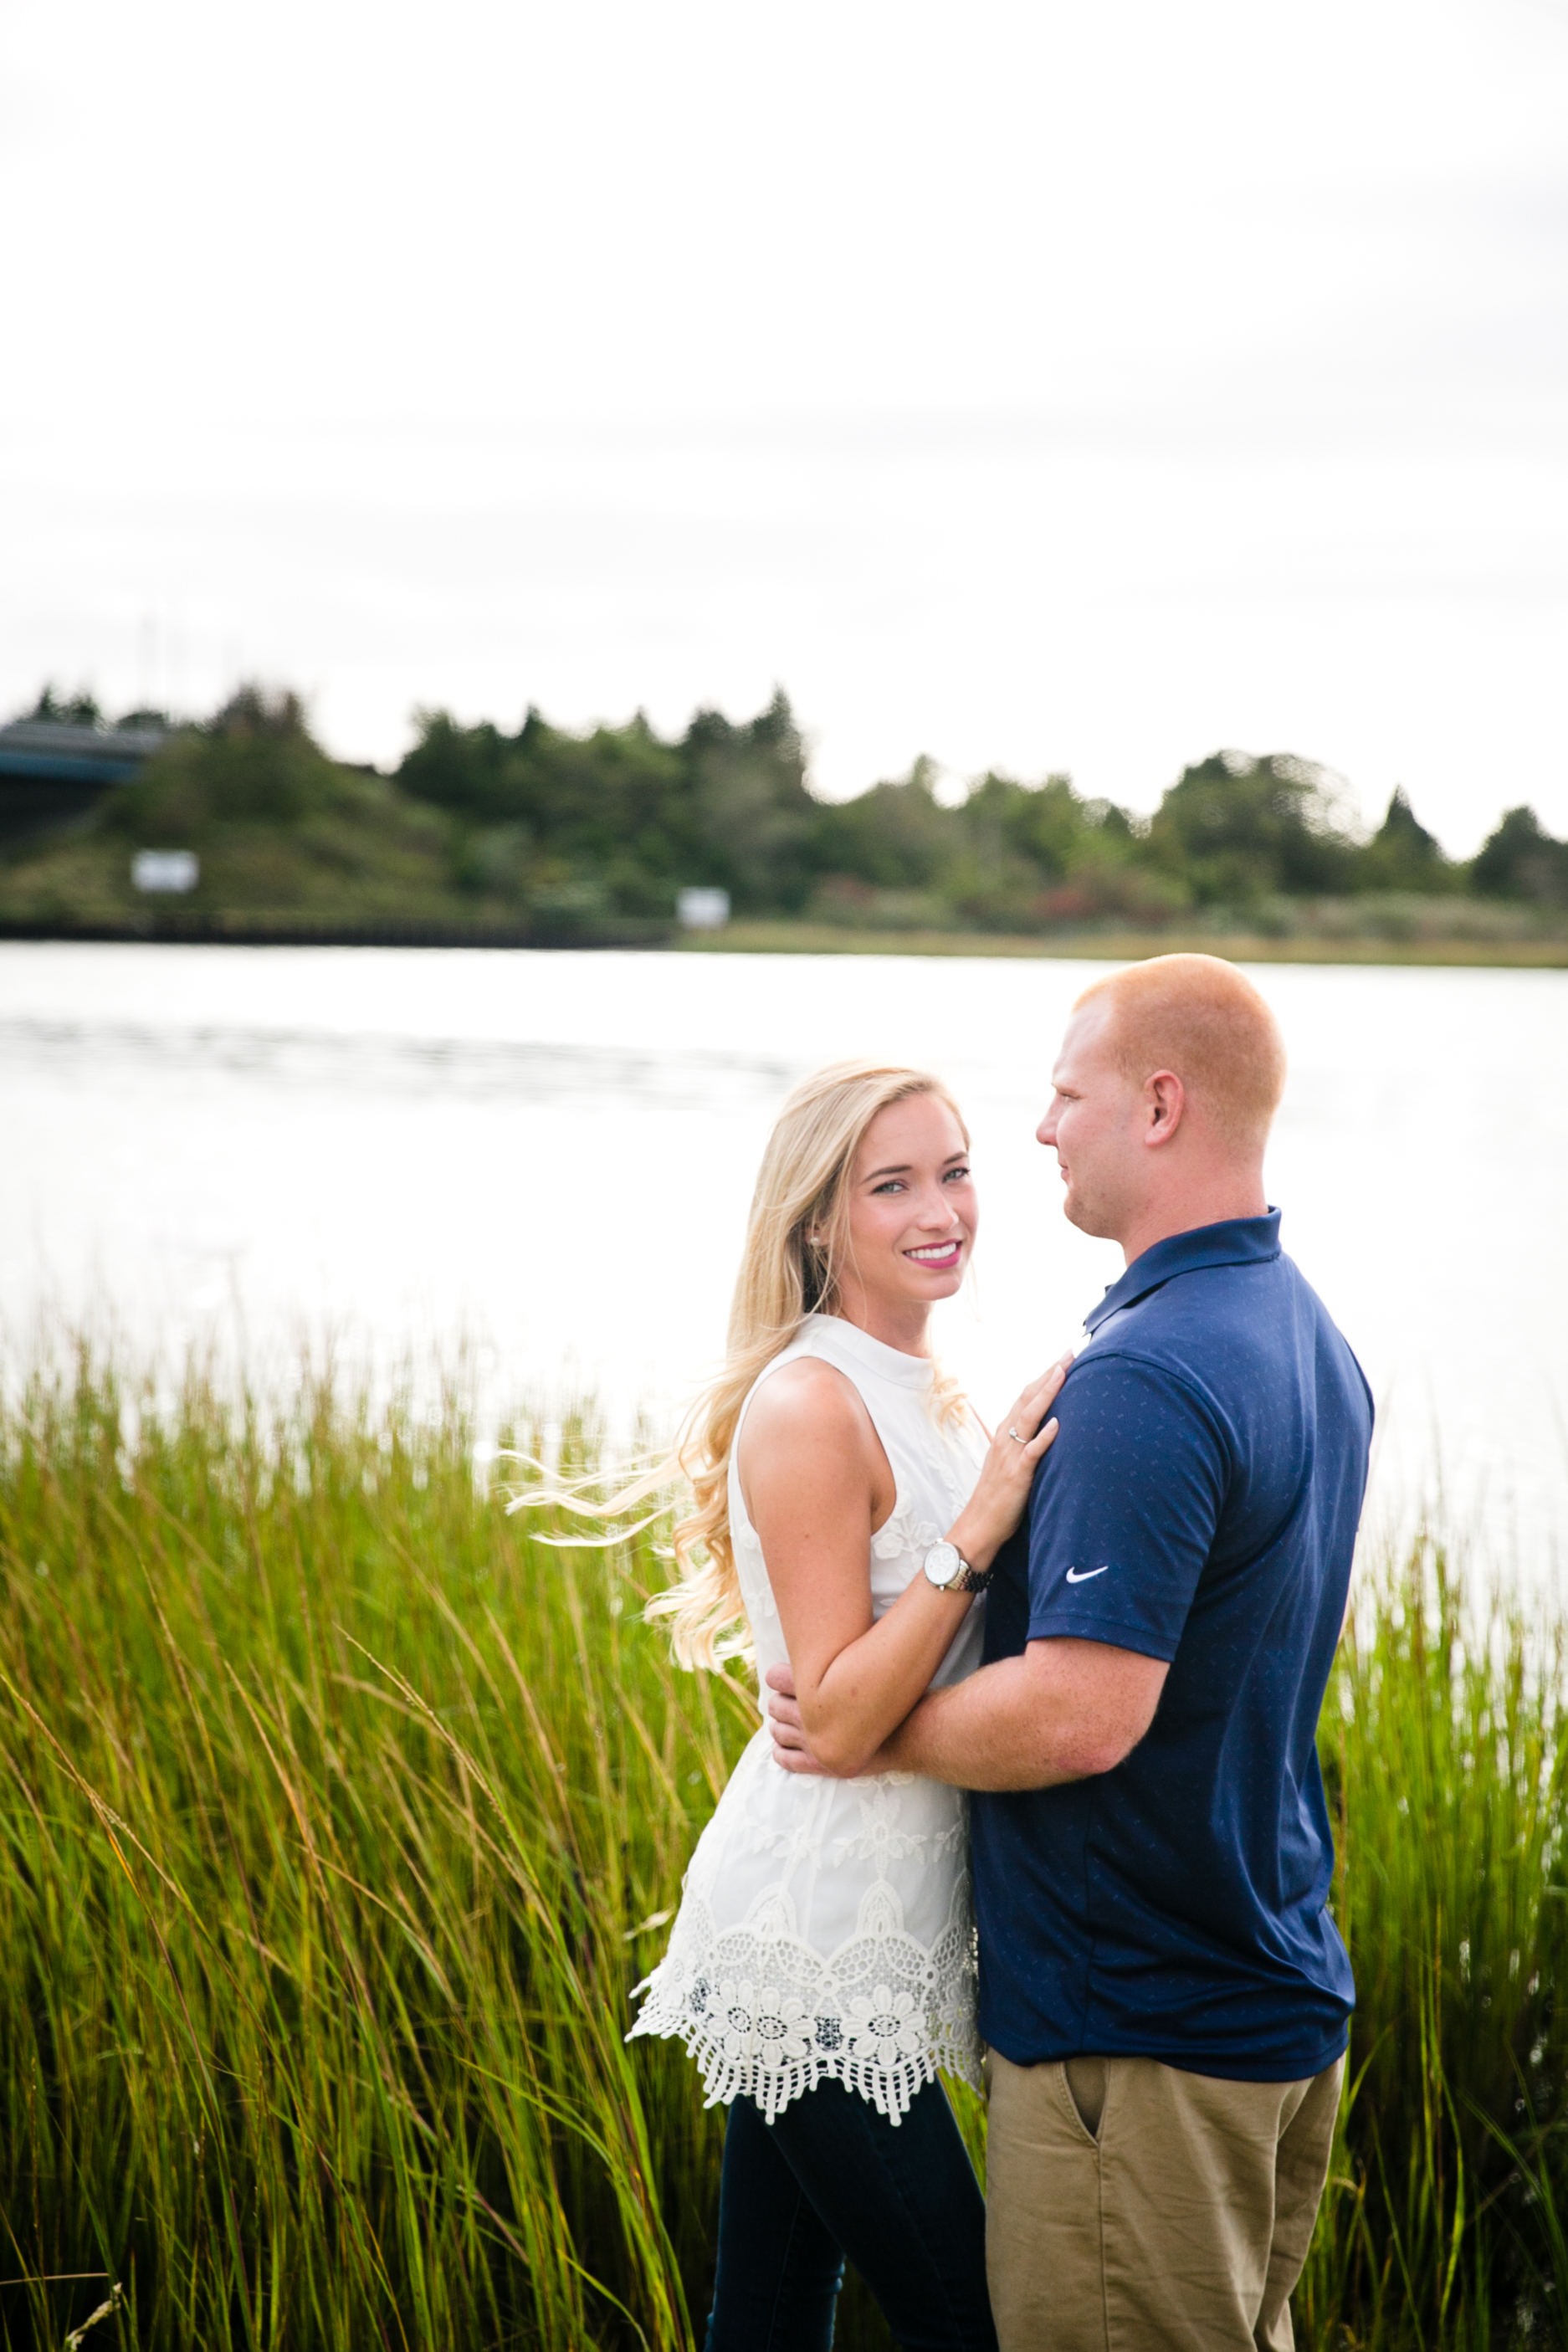 Wildwood New Jersey Engagement Photos - 004.jpg